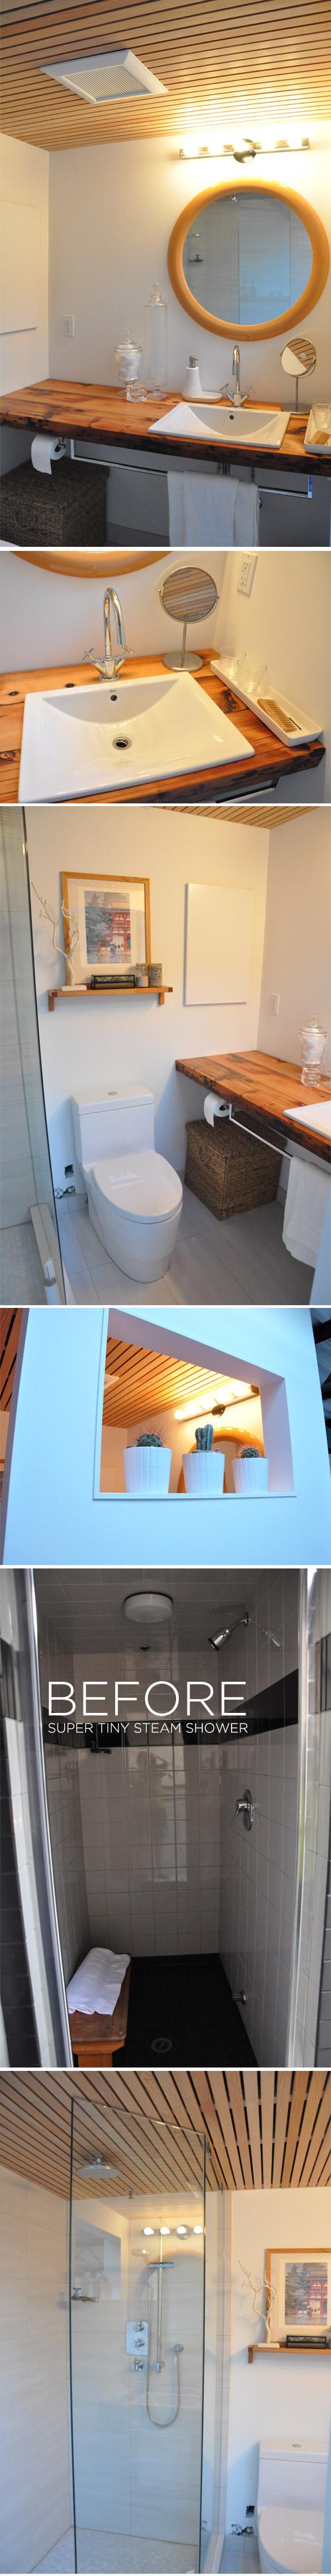 411-reno-bathroomdone